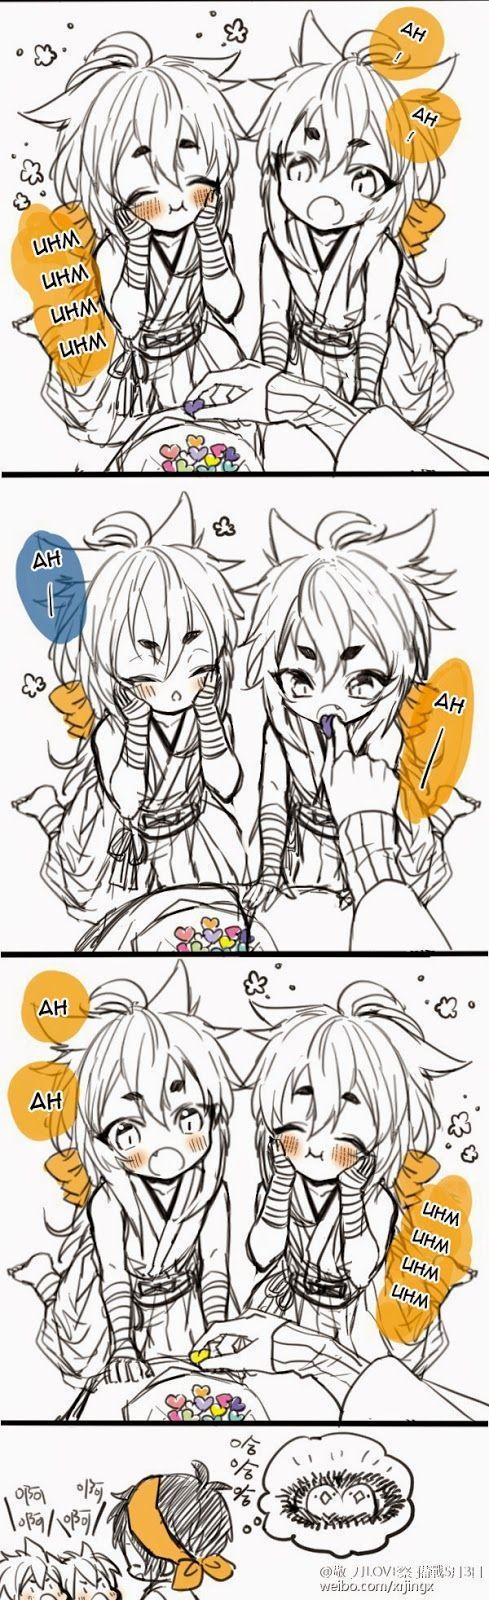 Saniwa's World: [TR Doujinshi #3]